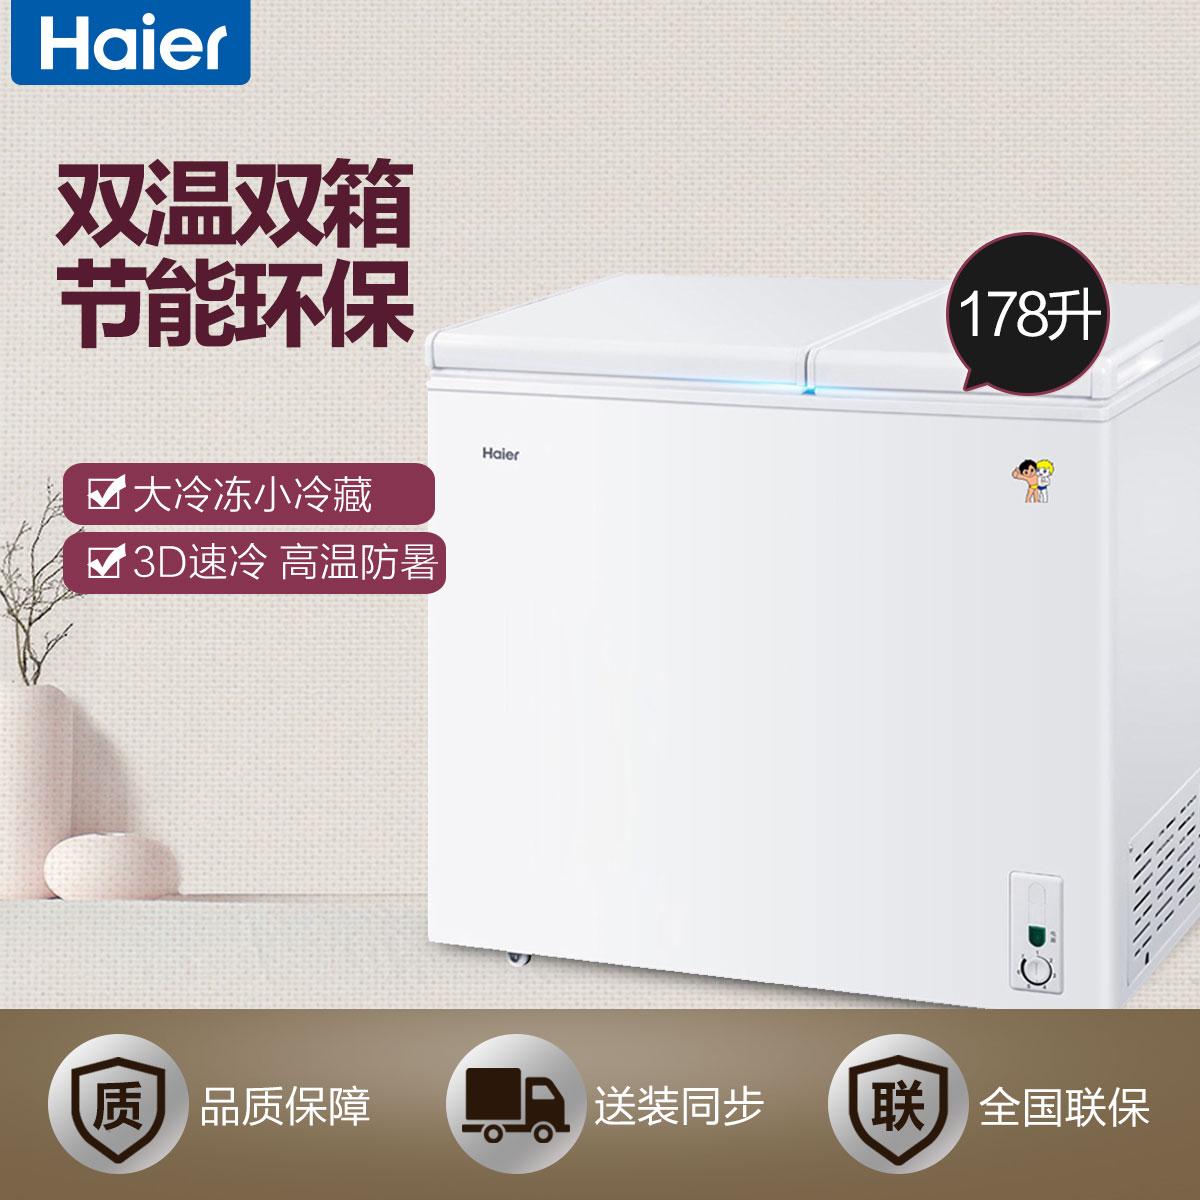 Haier/海尔 冷柜 FCD-178XHT 178升大冷冻小冷藏 双箱双温区冰柜 卧式冰箱 家用商用二合一